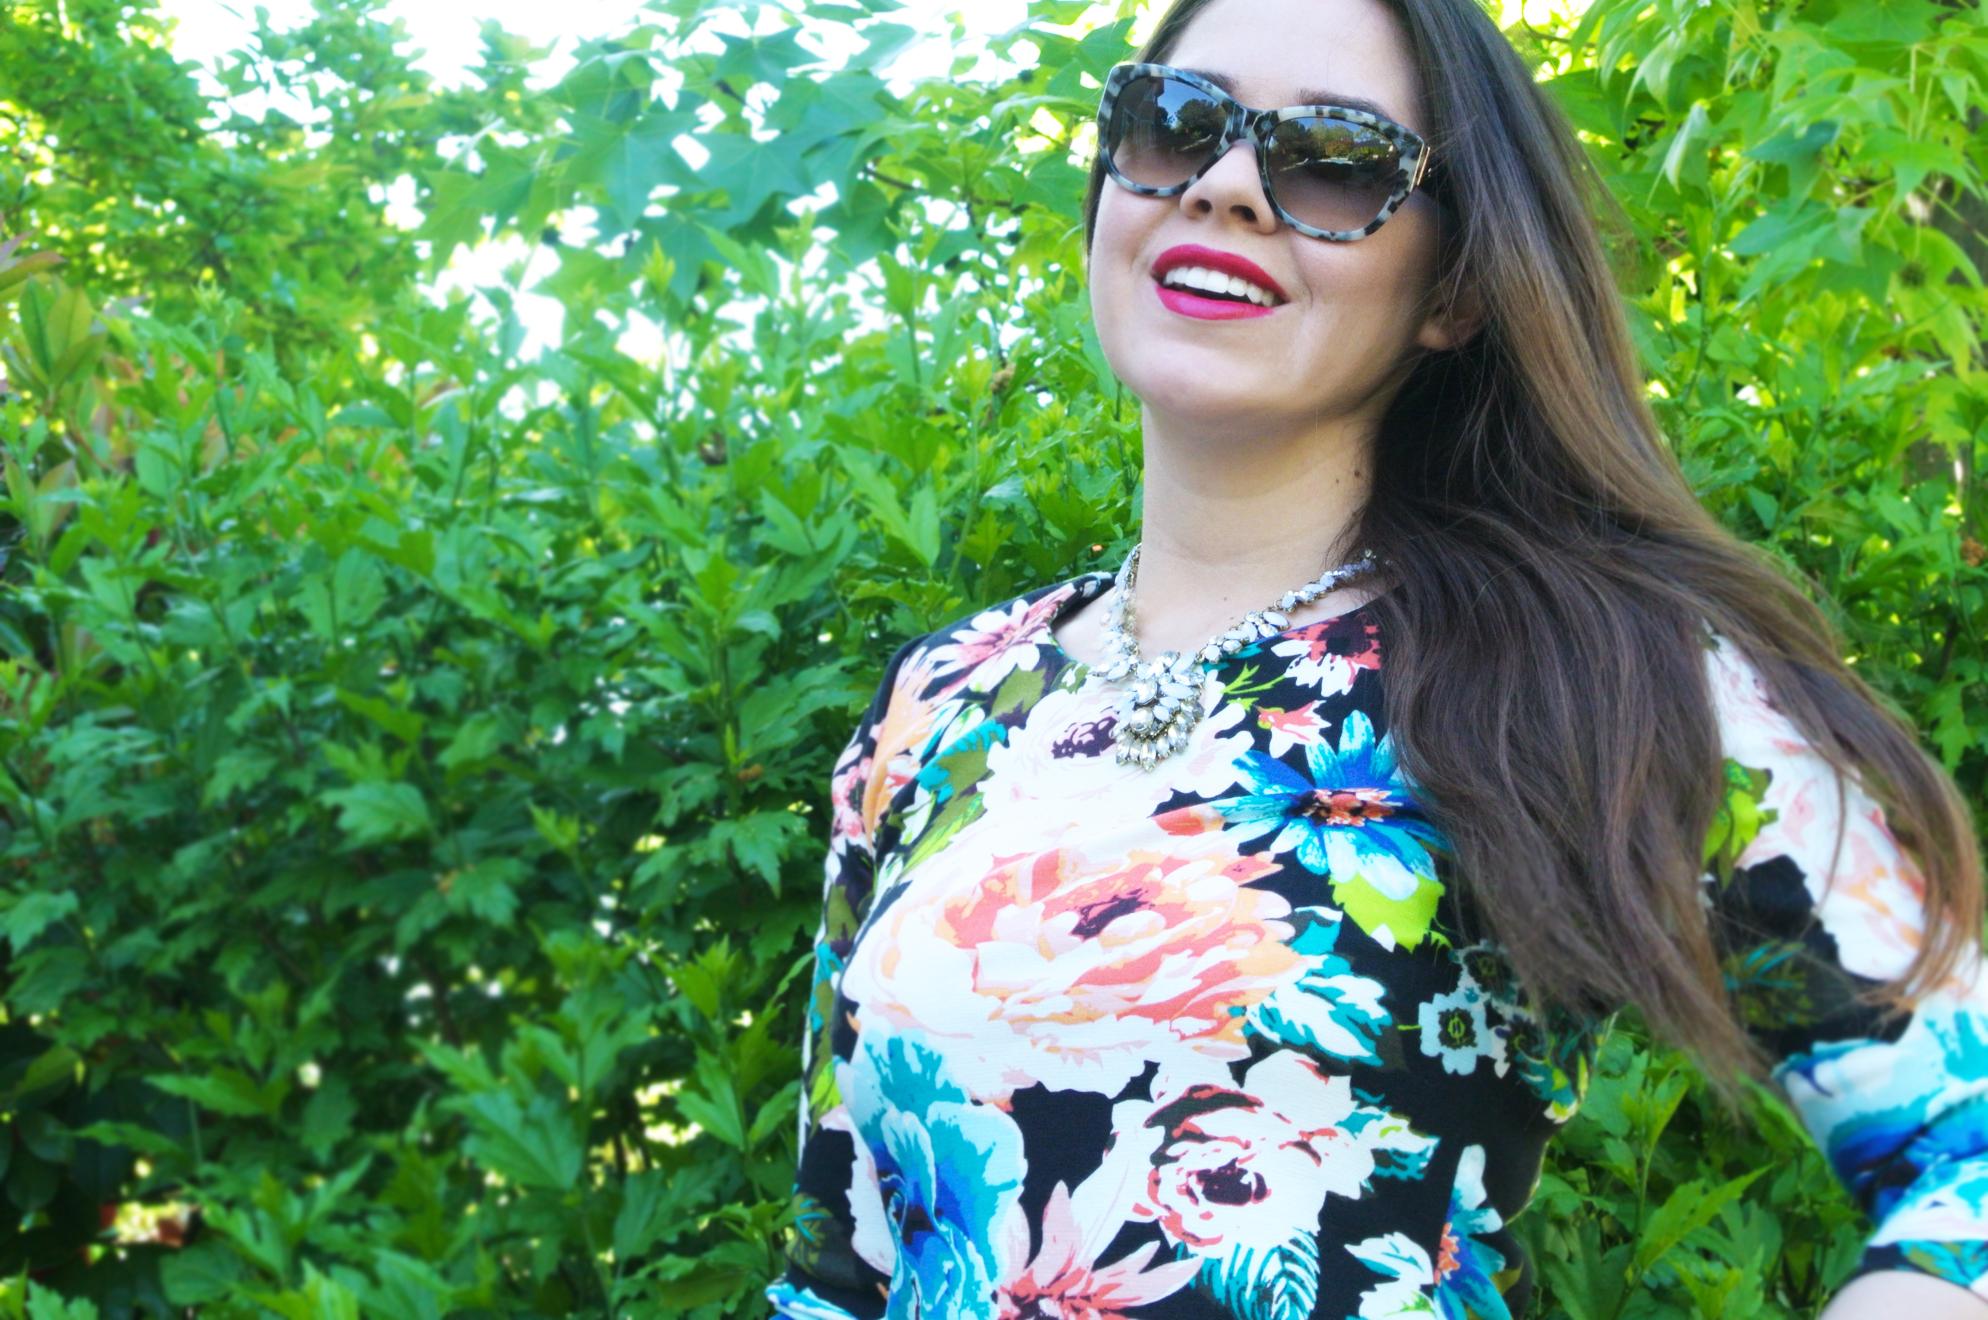 Dress: H&M   Sunnies:  Kate Spade    Necklace: Etsy   Lips:  Rimmel London c/o